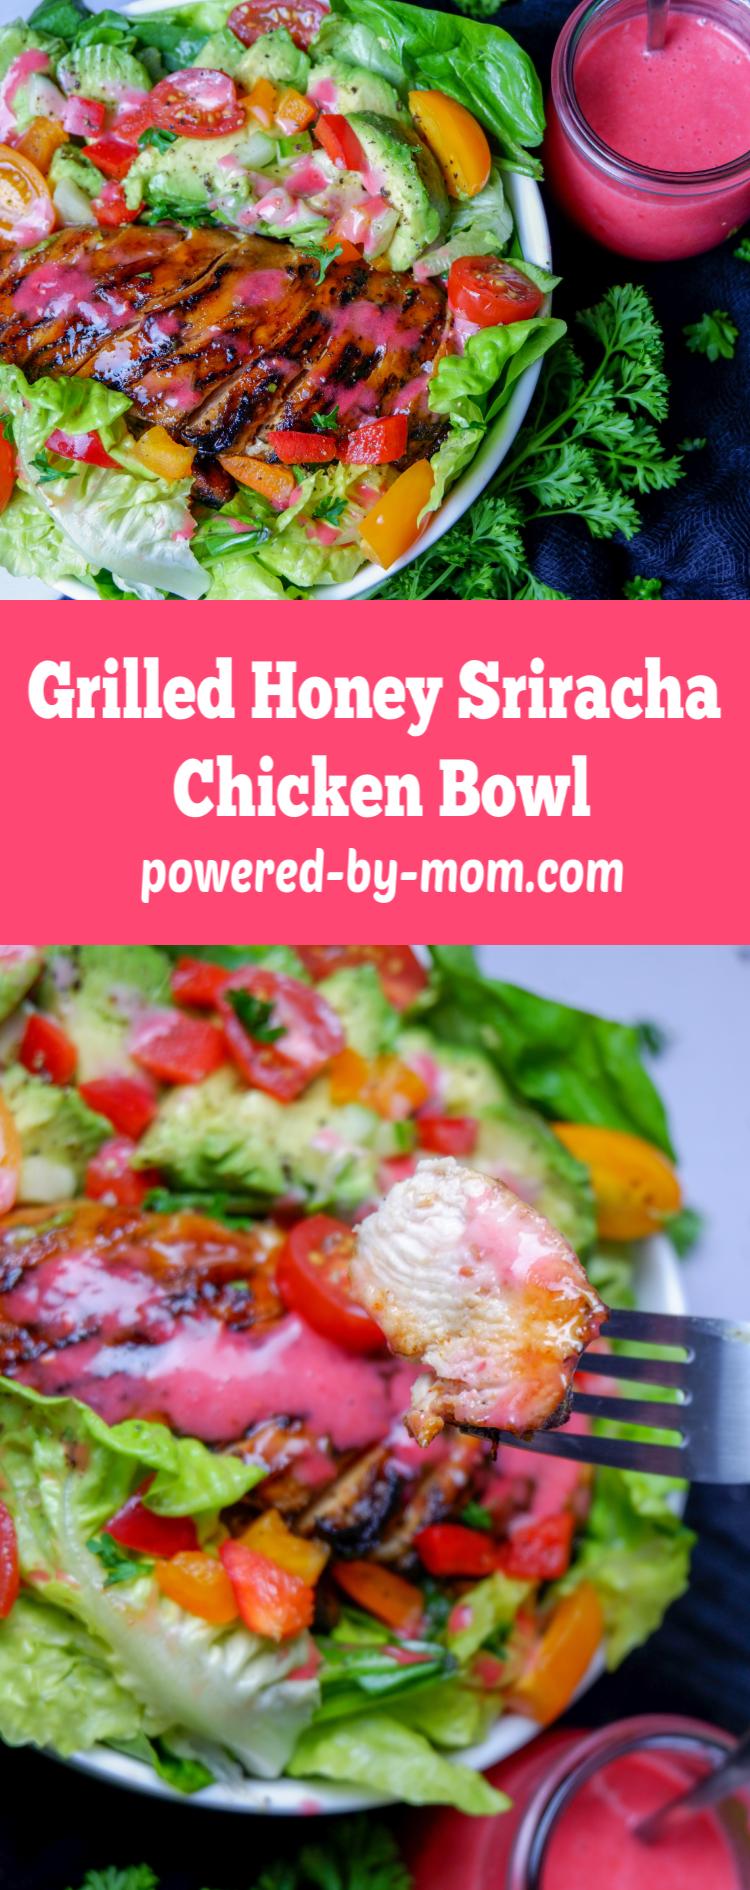 Grilled Honey Sriracha Chicken Bowl